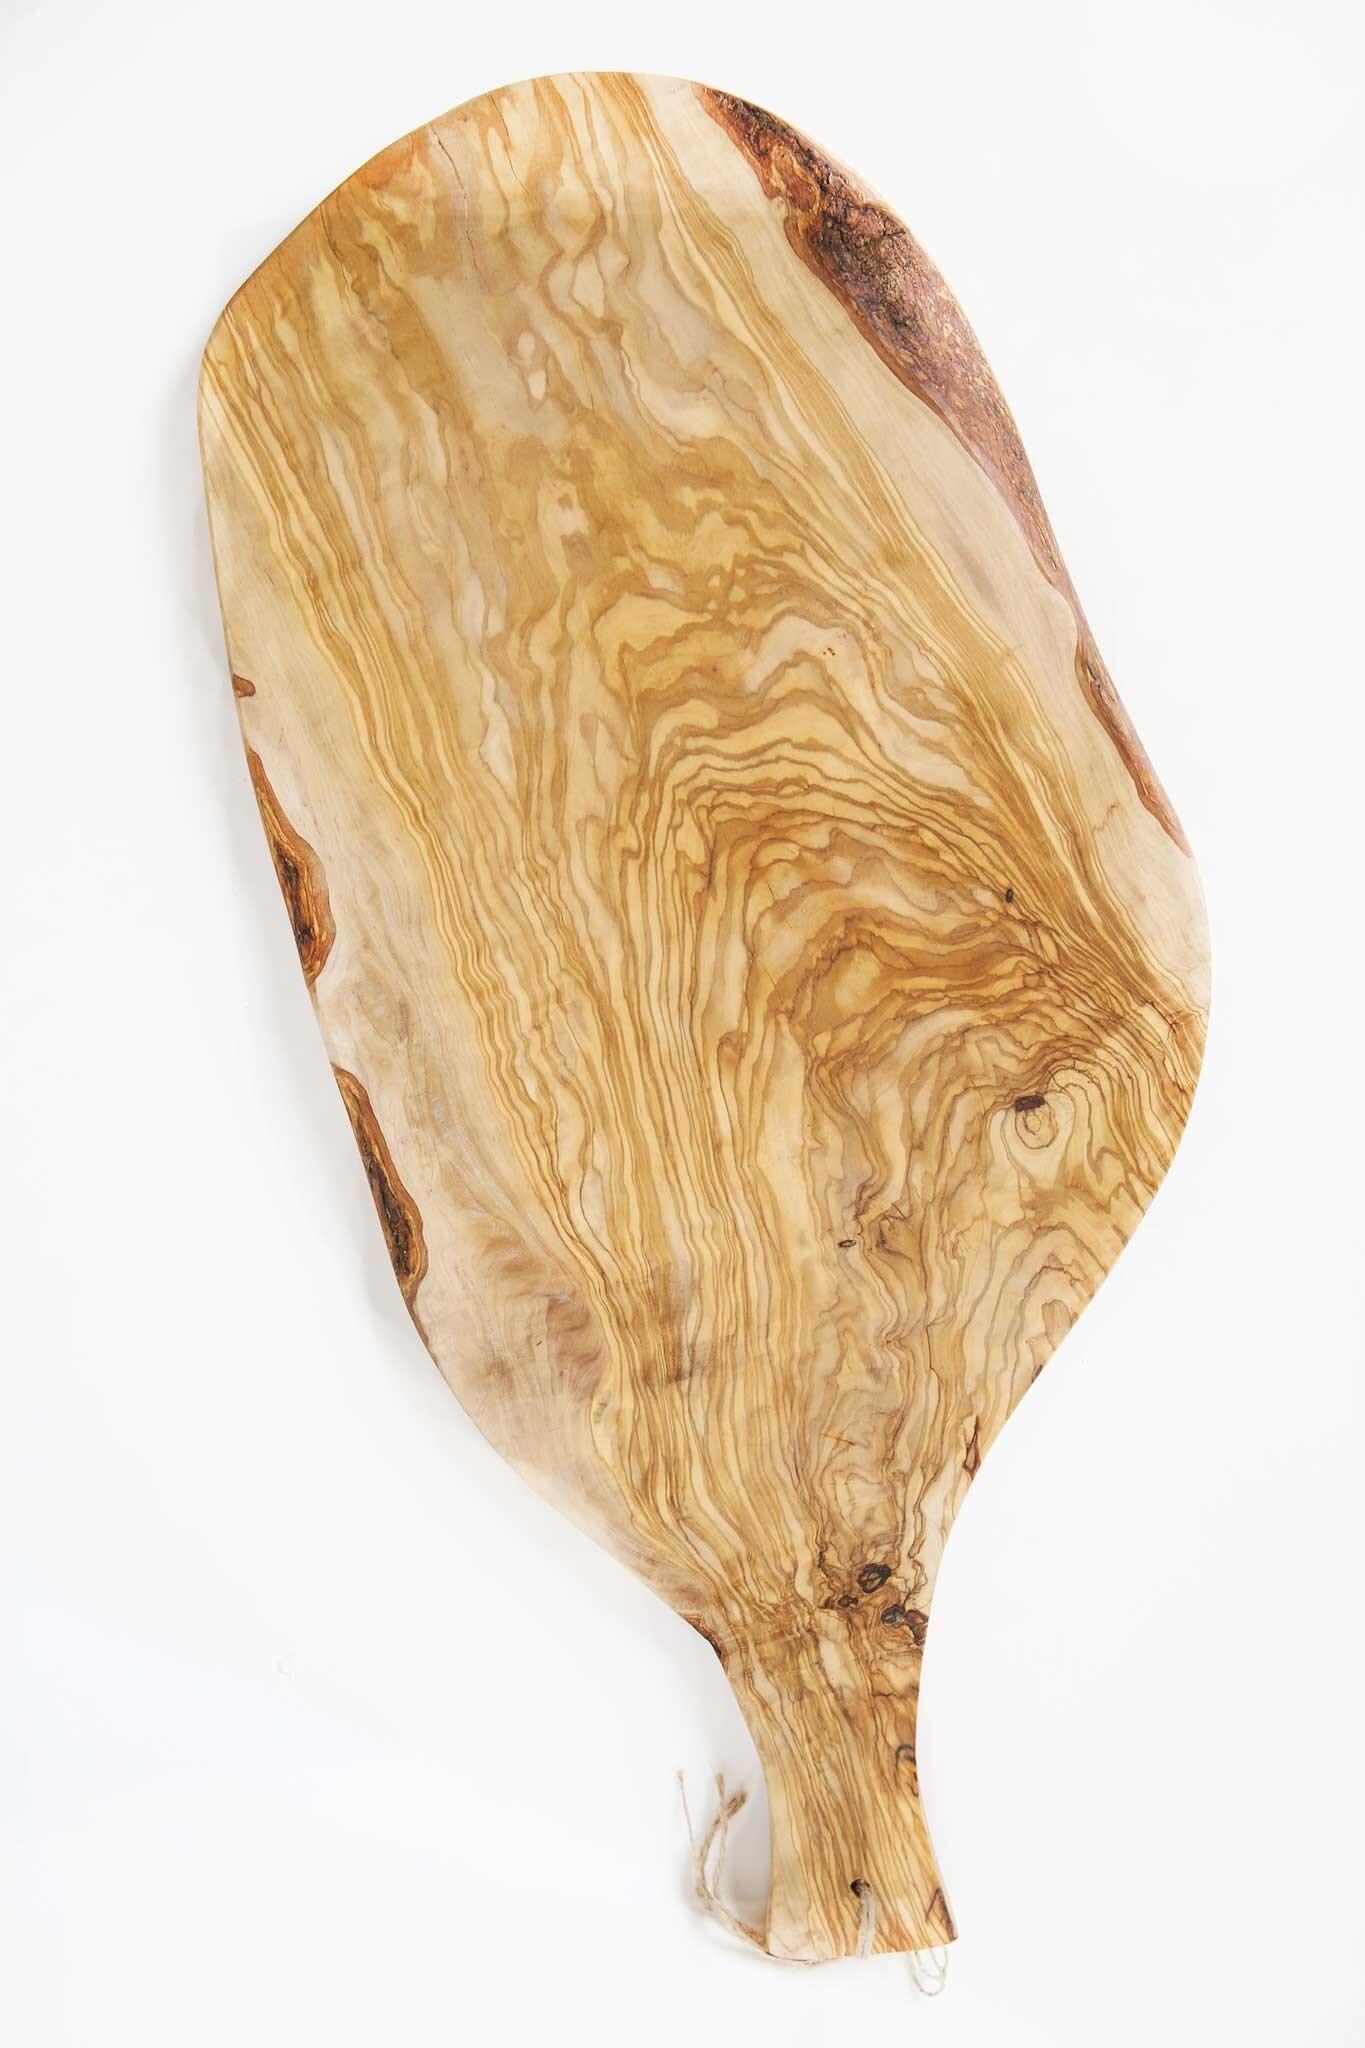 Olive Wood Rustic Cutting Board Dorset Pond